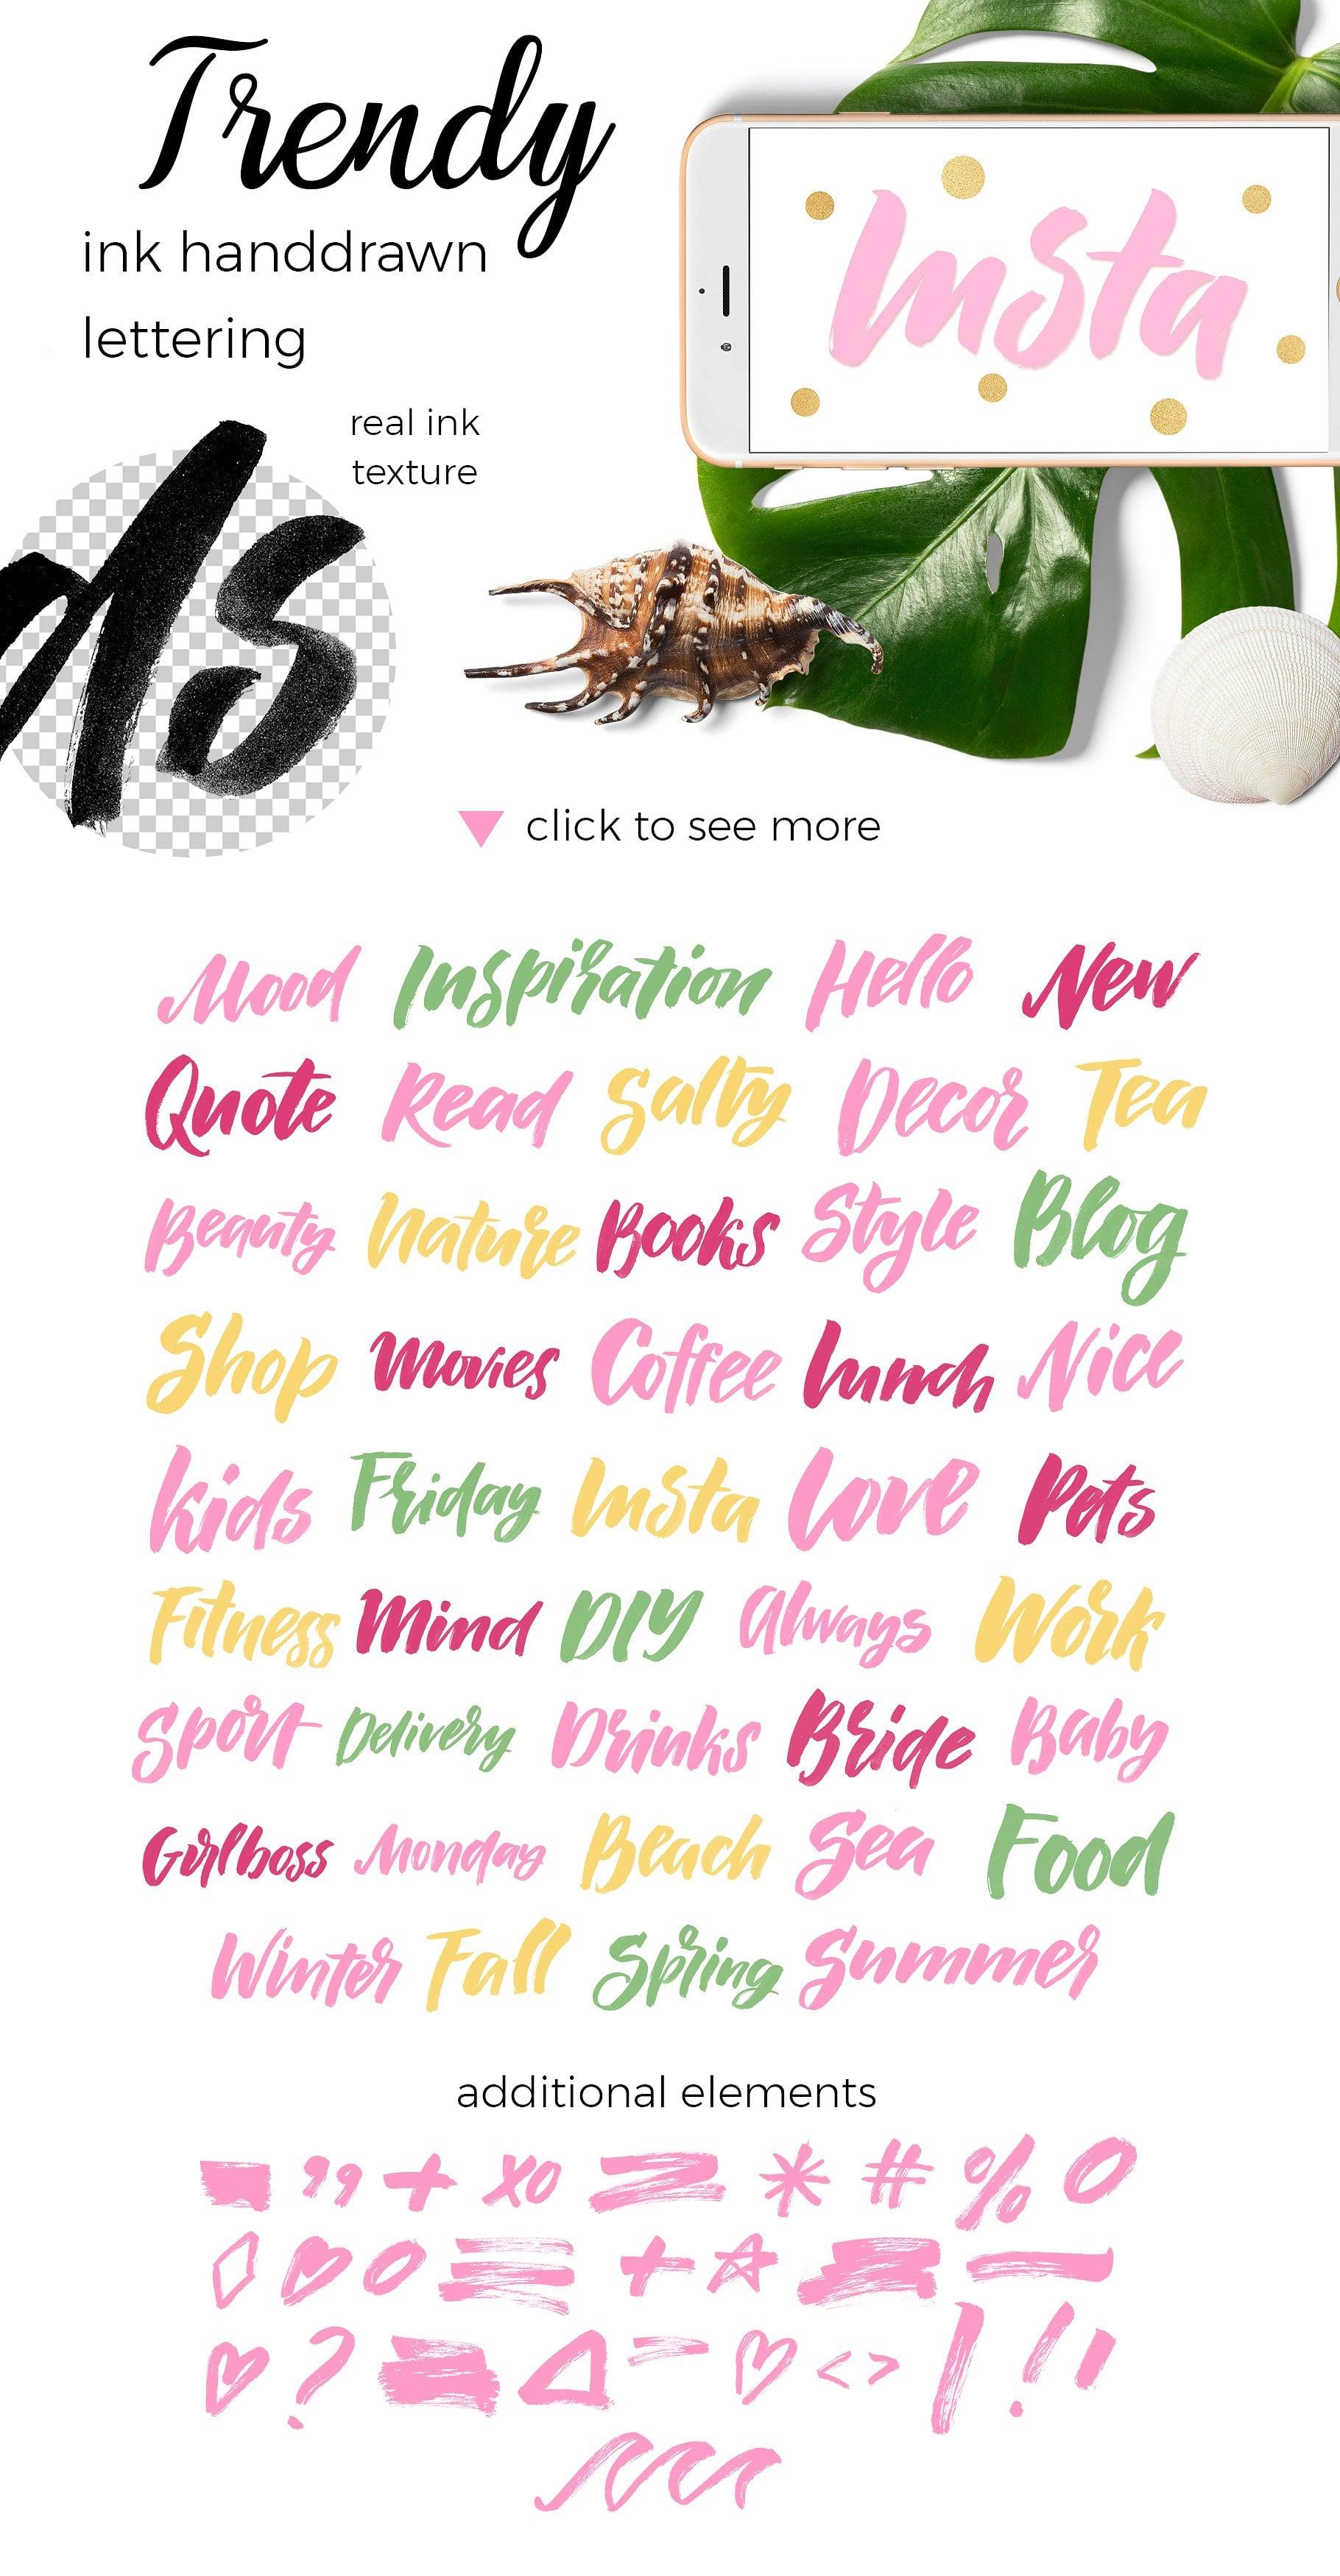 Insta Lady: Instagram Highlight Icons & Posts - $22 - prev3